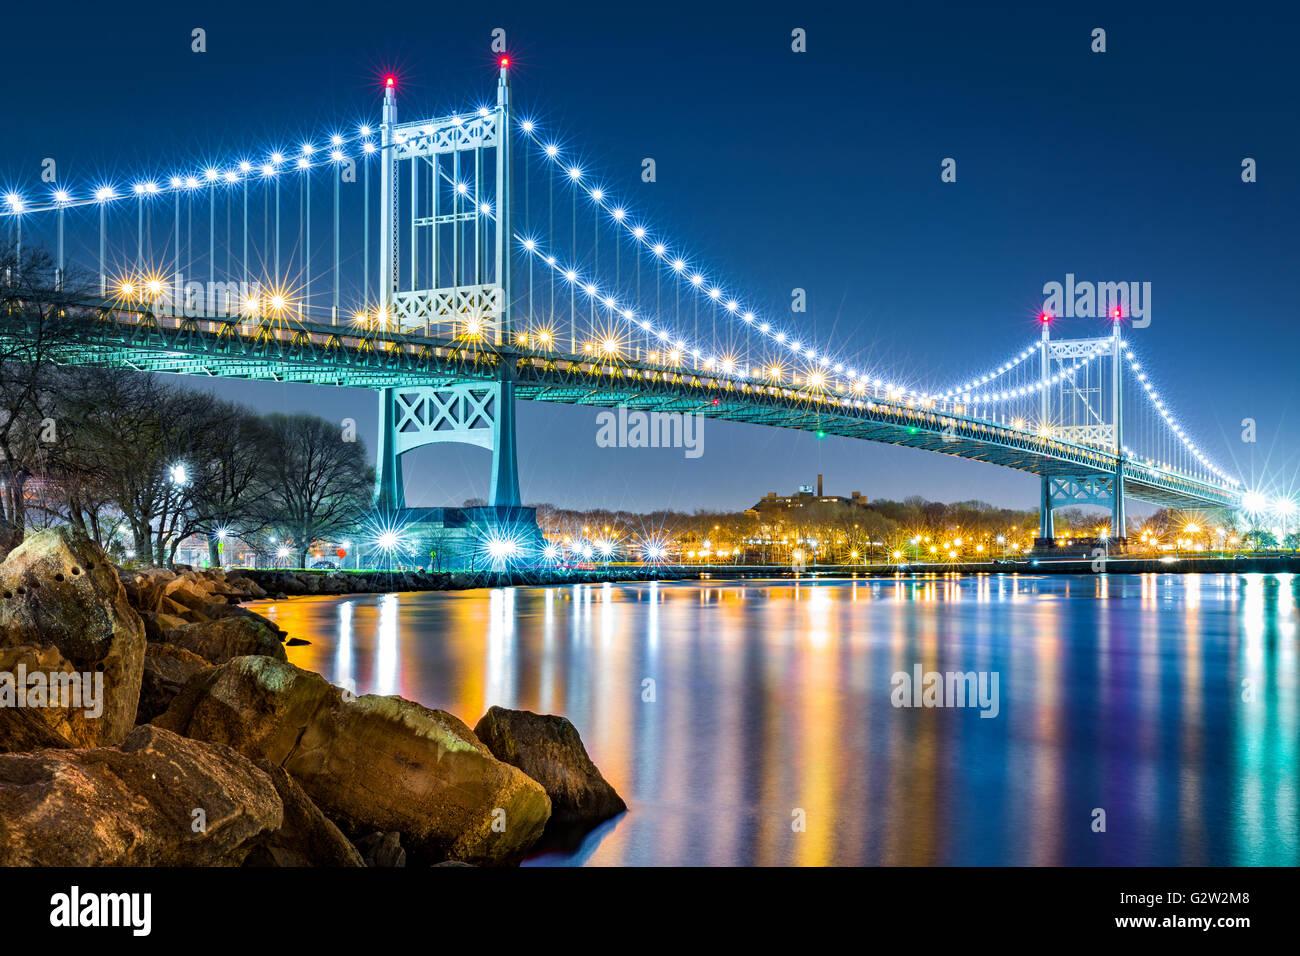 Robert F. Kennedy-Brücke (aka Triboro Bridge) bei Nacht gesehen aus Randalls Island, New York Stockbild